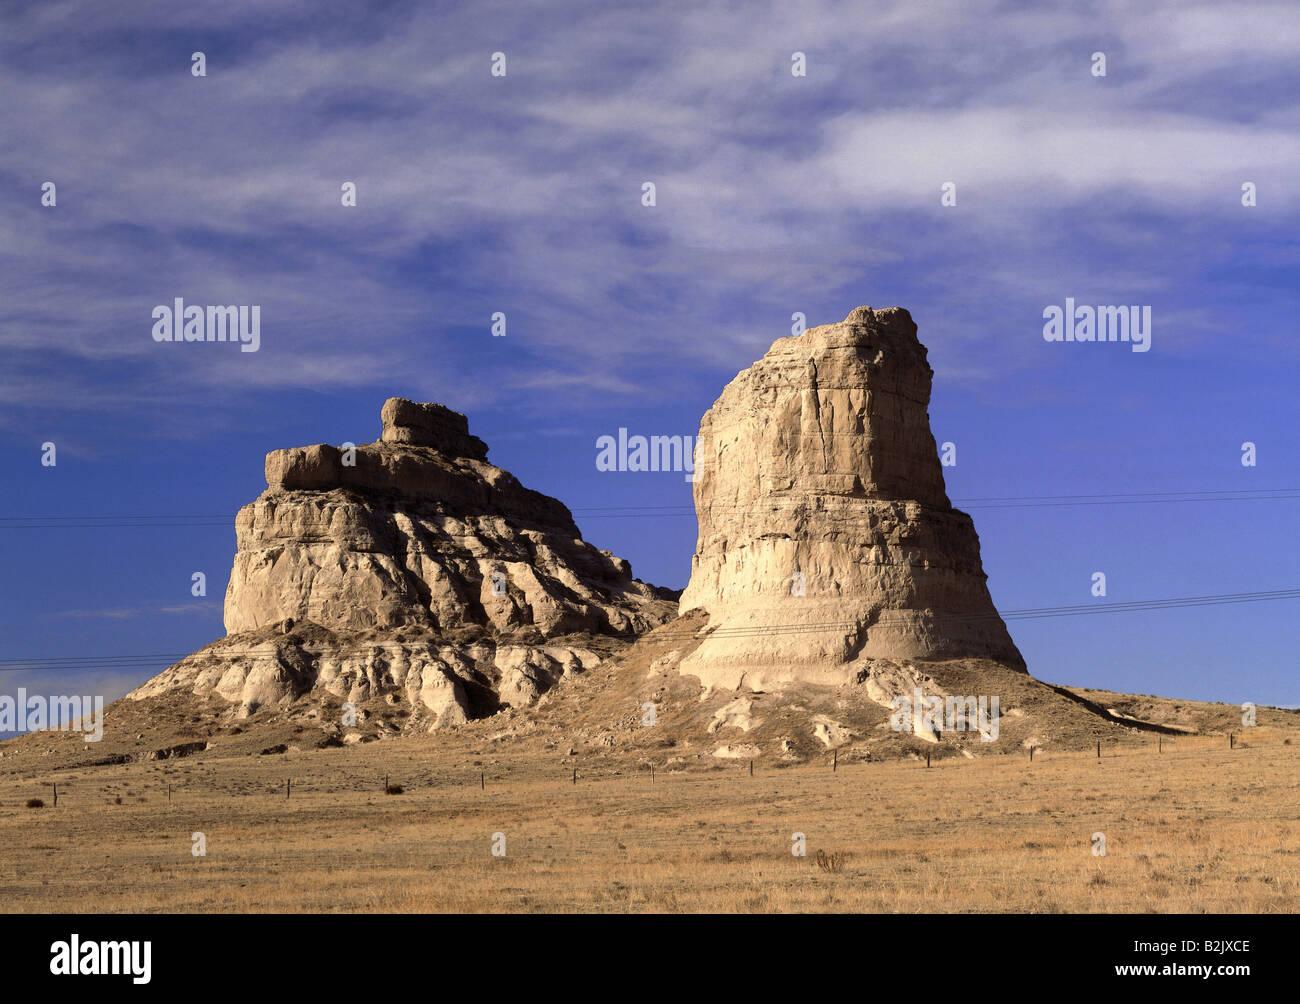 geography / travel, USA, Nebraska, Bridgeport, landscapes, rock formations Courthouse Rock and Jail Rock, Additional Stock Photo